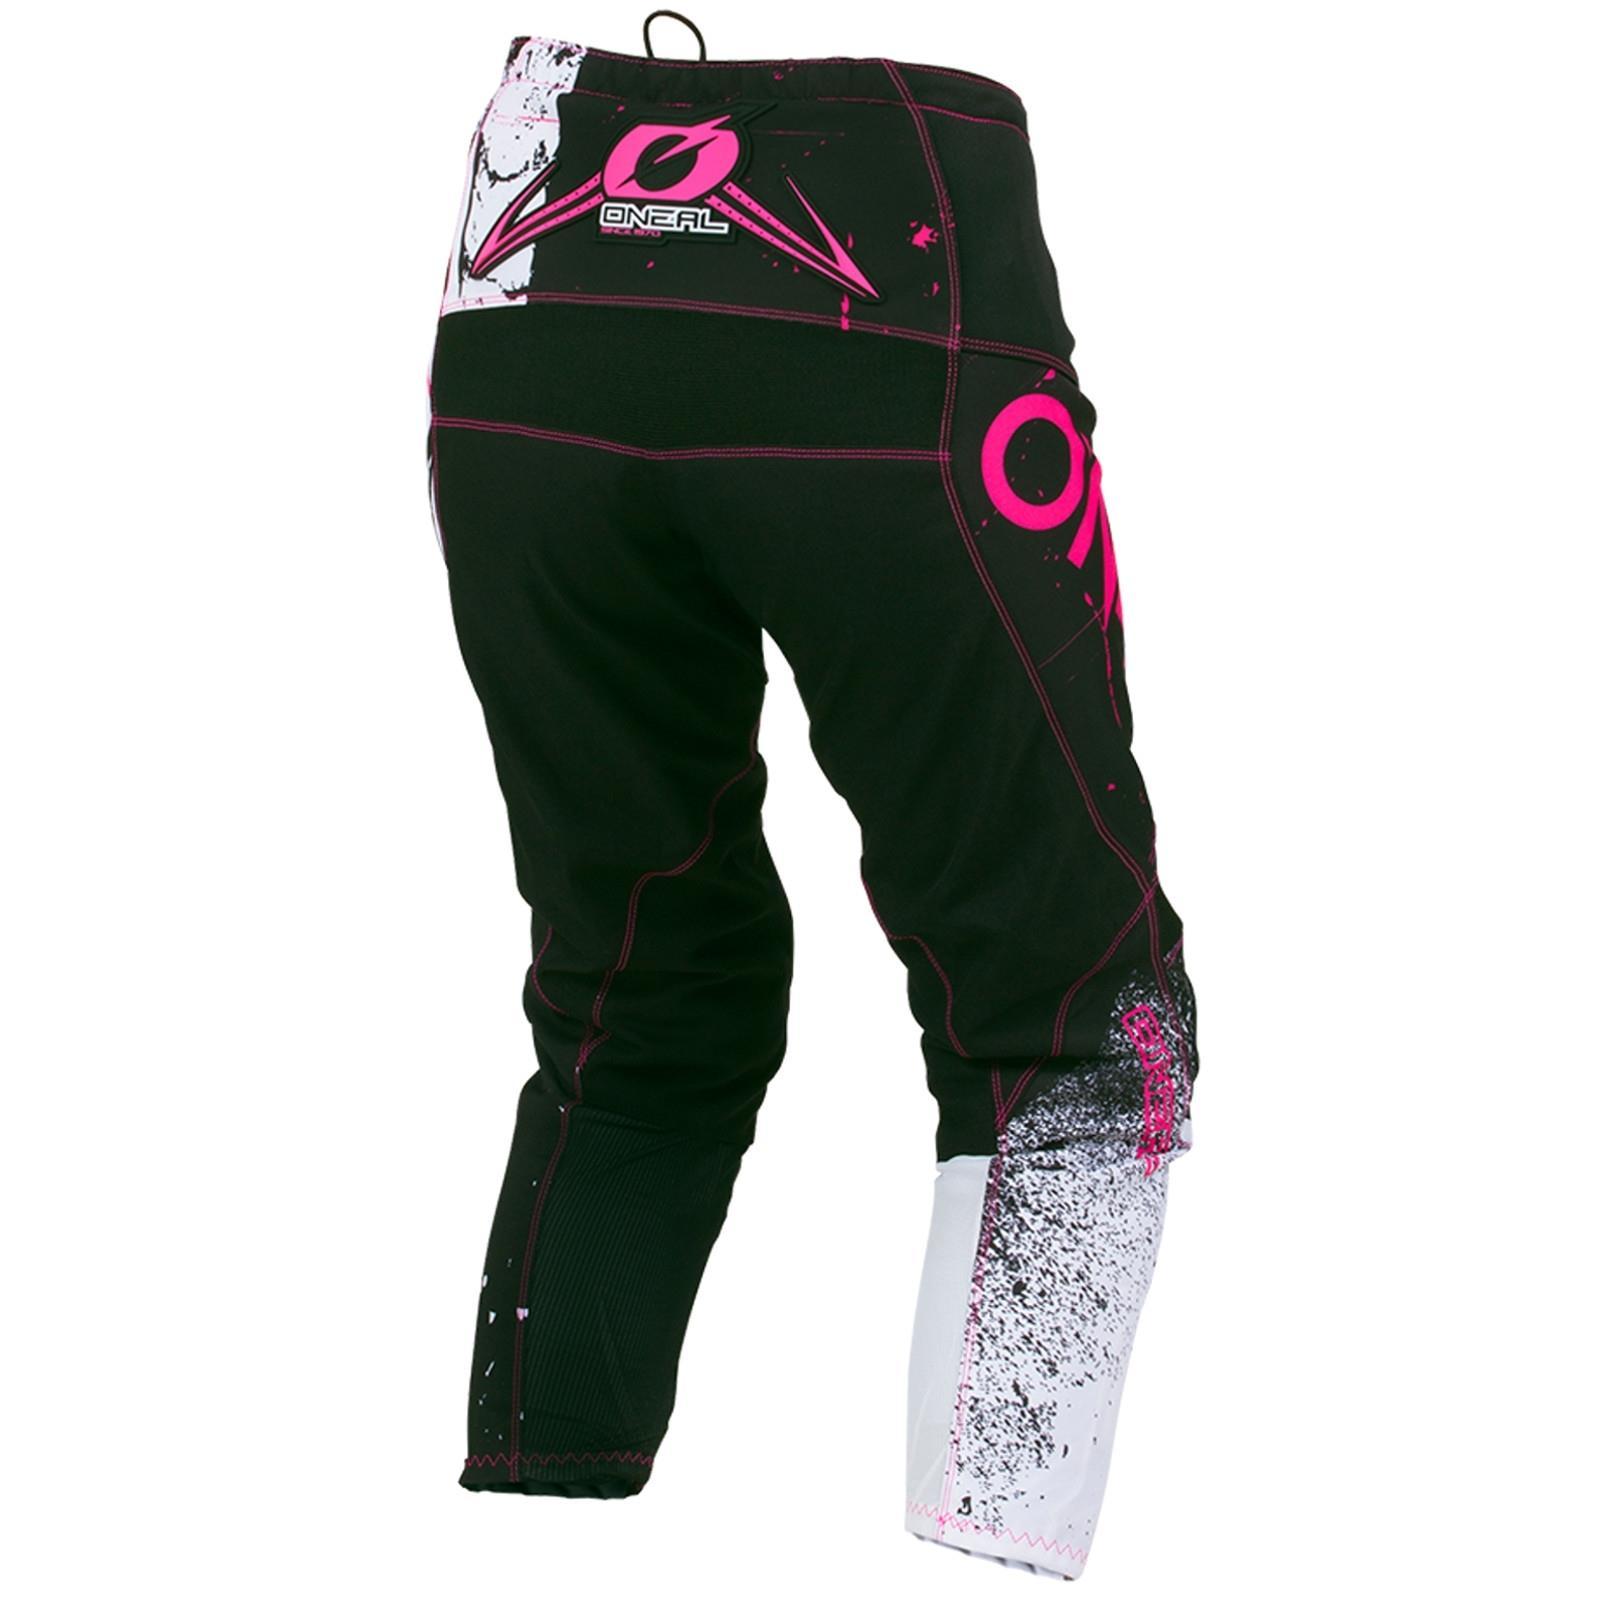 ONEAL-DONNA-MOTO-CROSS-MTB-SHIRT-ragazze-Jersey-Pantaloni-Rosa-Casco-bicicletta-DH-ENDURO miniatura 55